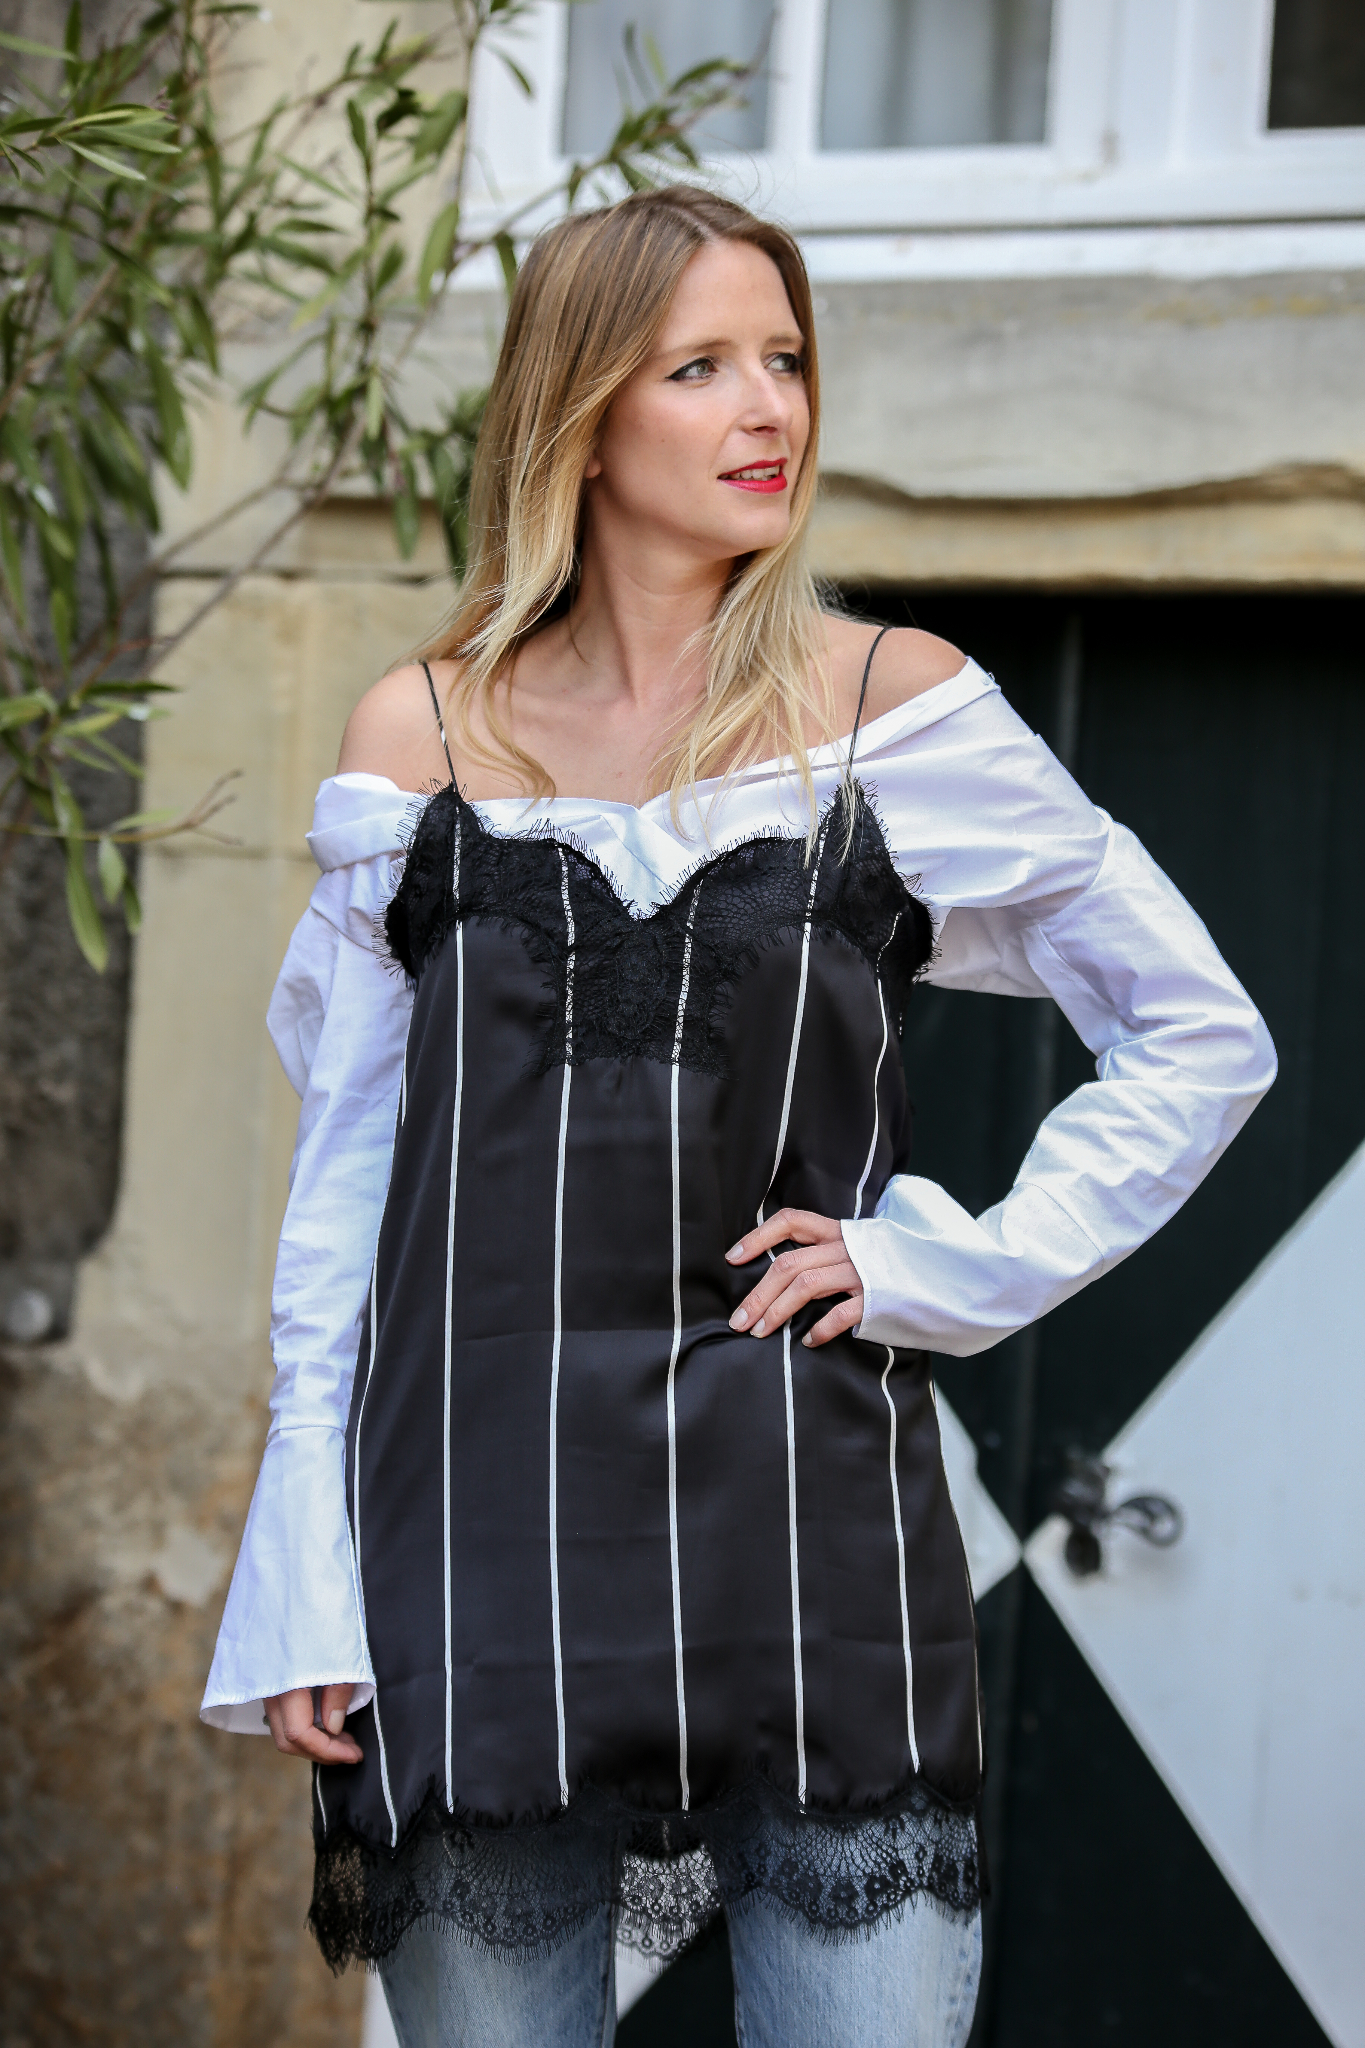 Fashion_Outfit_Off_Shoulder_Striped_Slipdress_MOD - by Monique-7